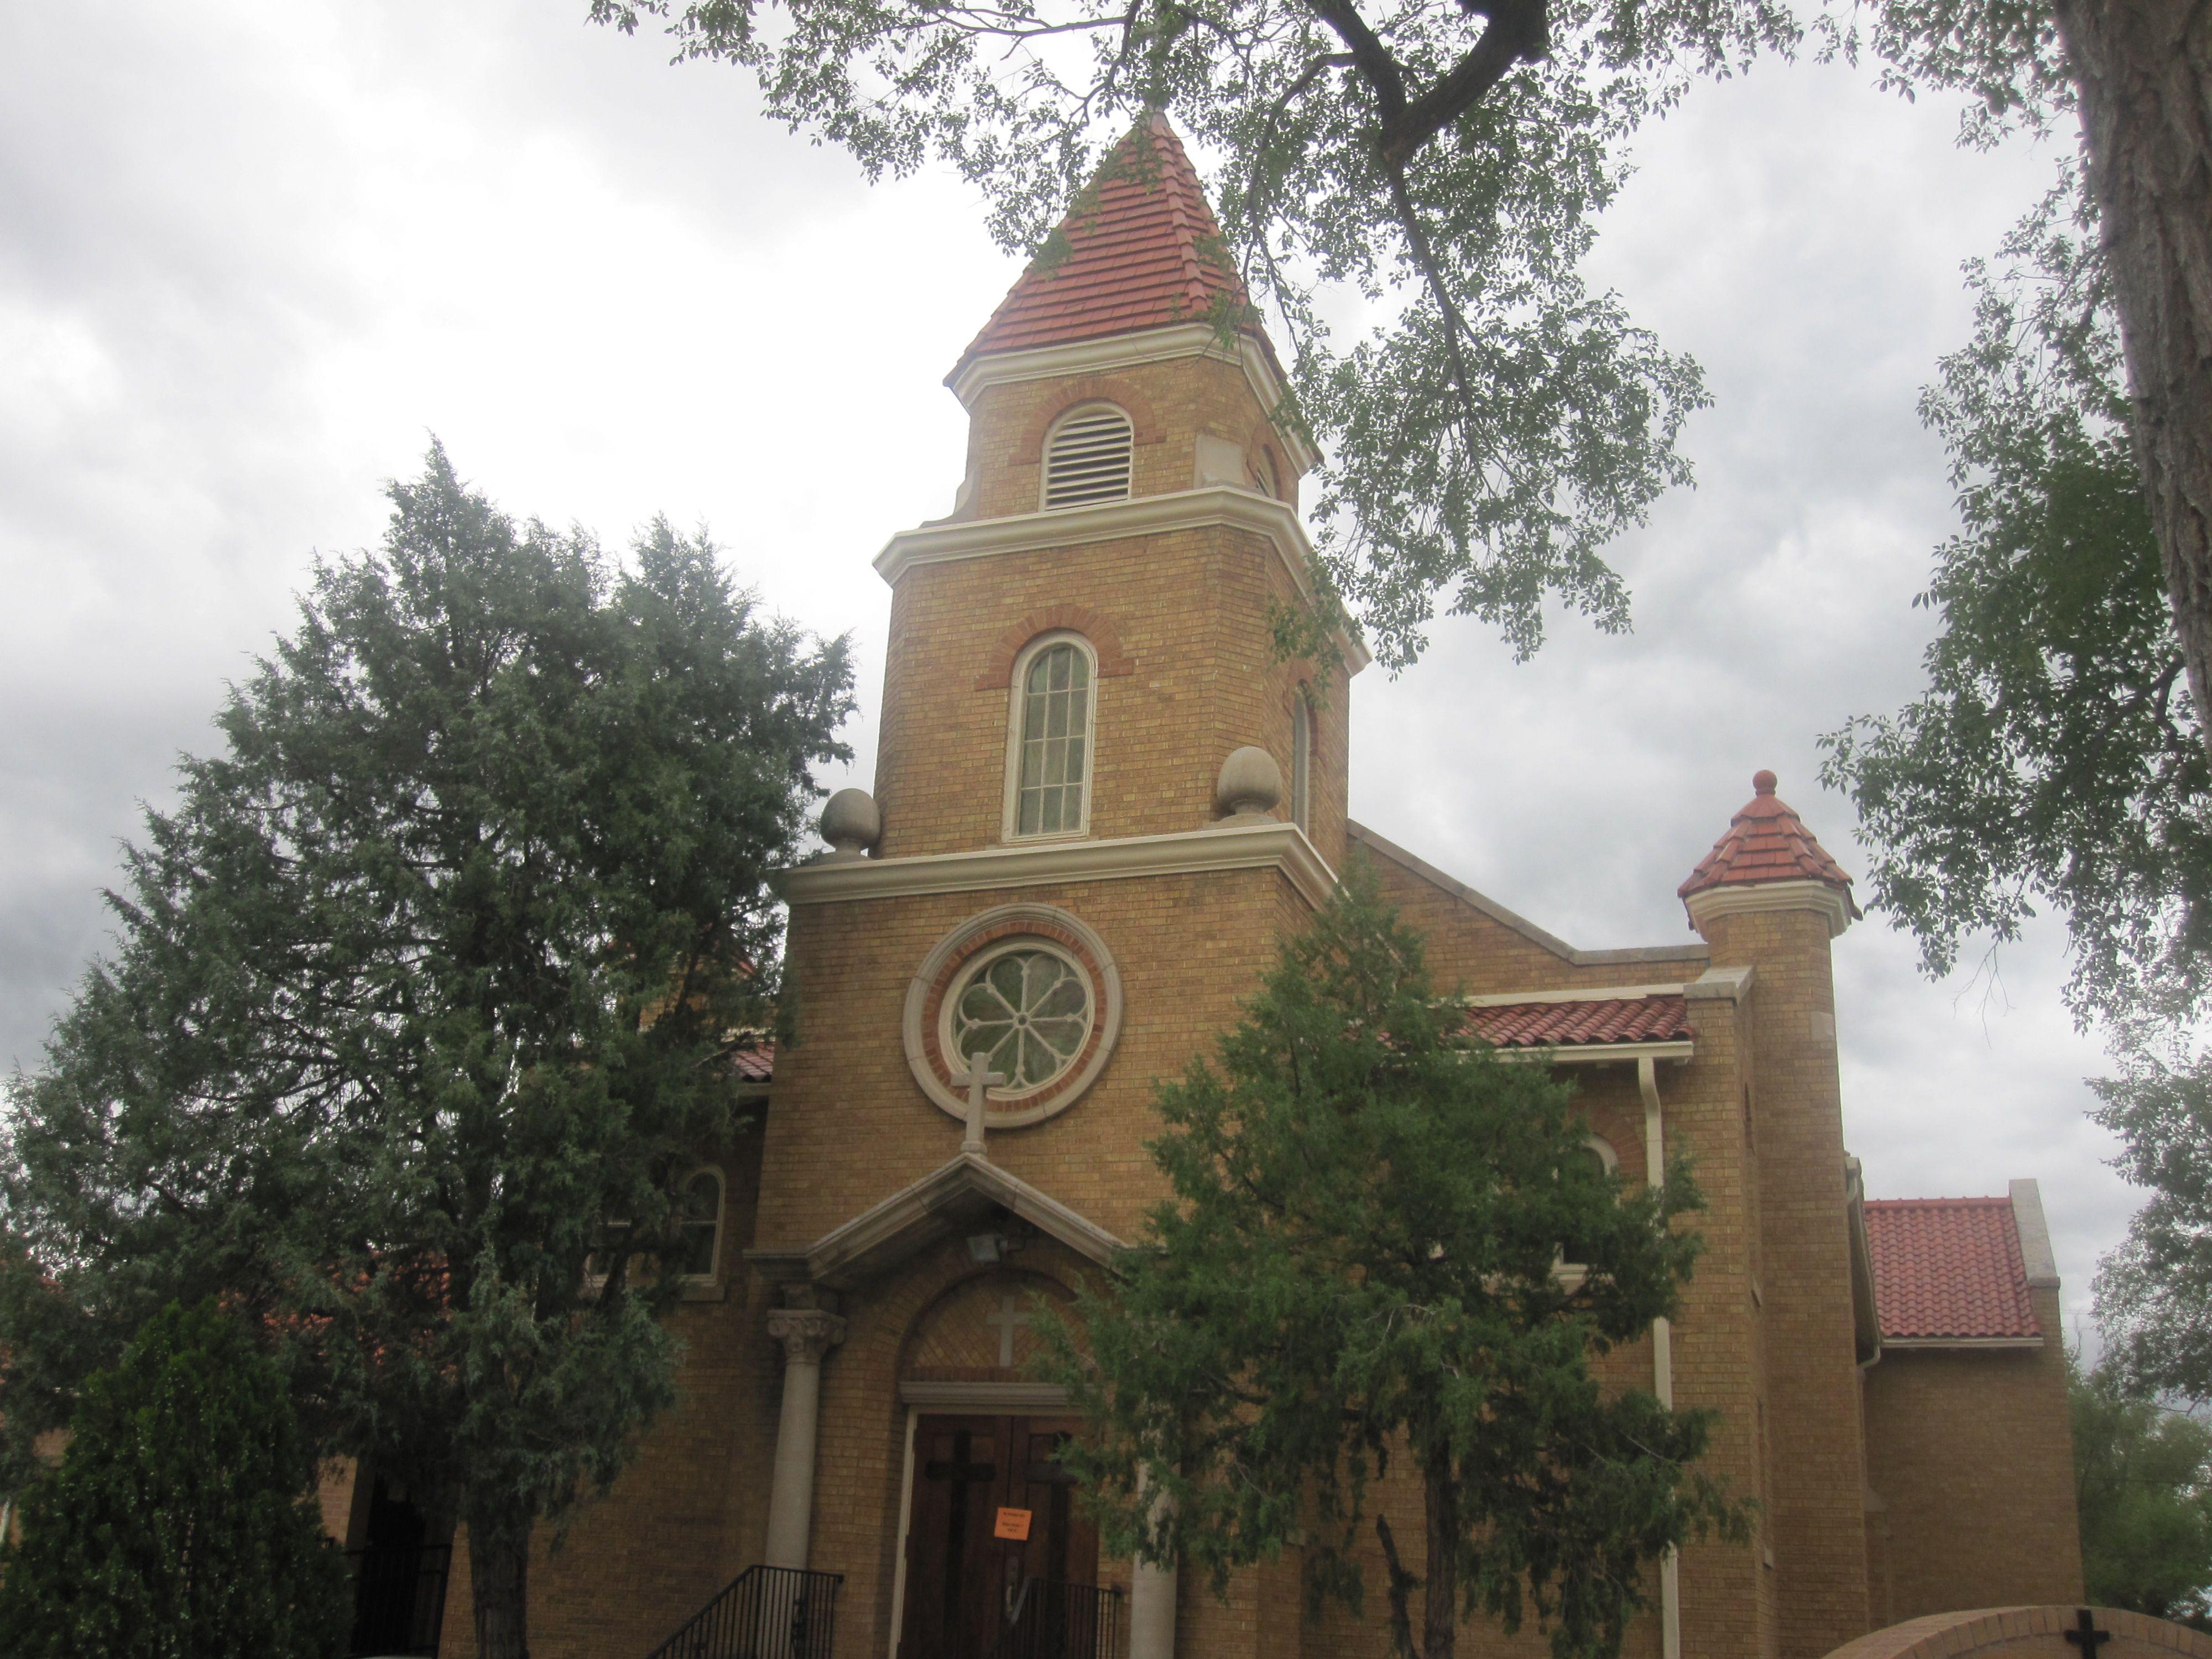 St Mary's Catholic Parish Hall